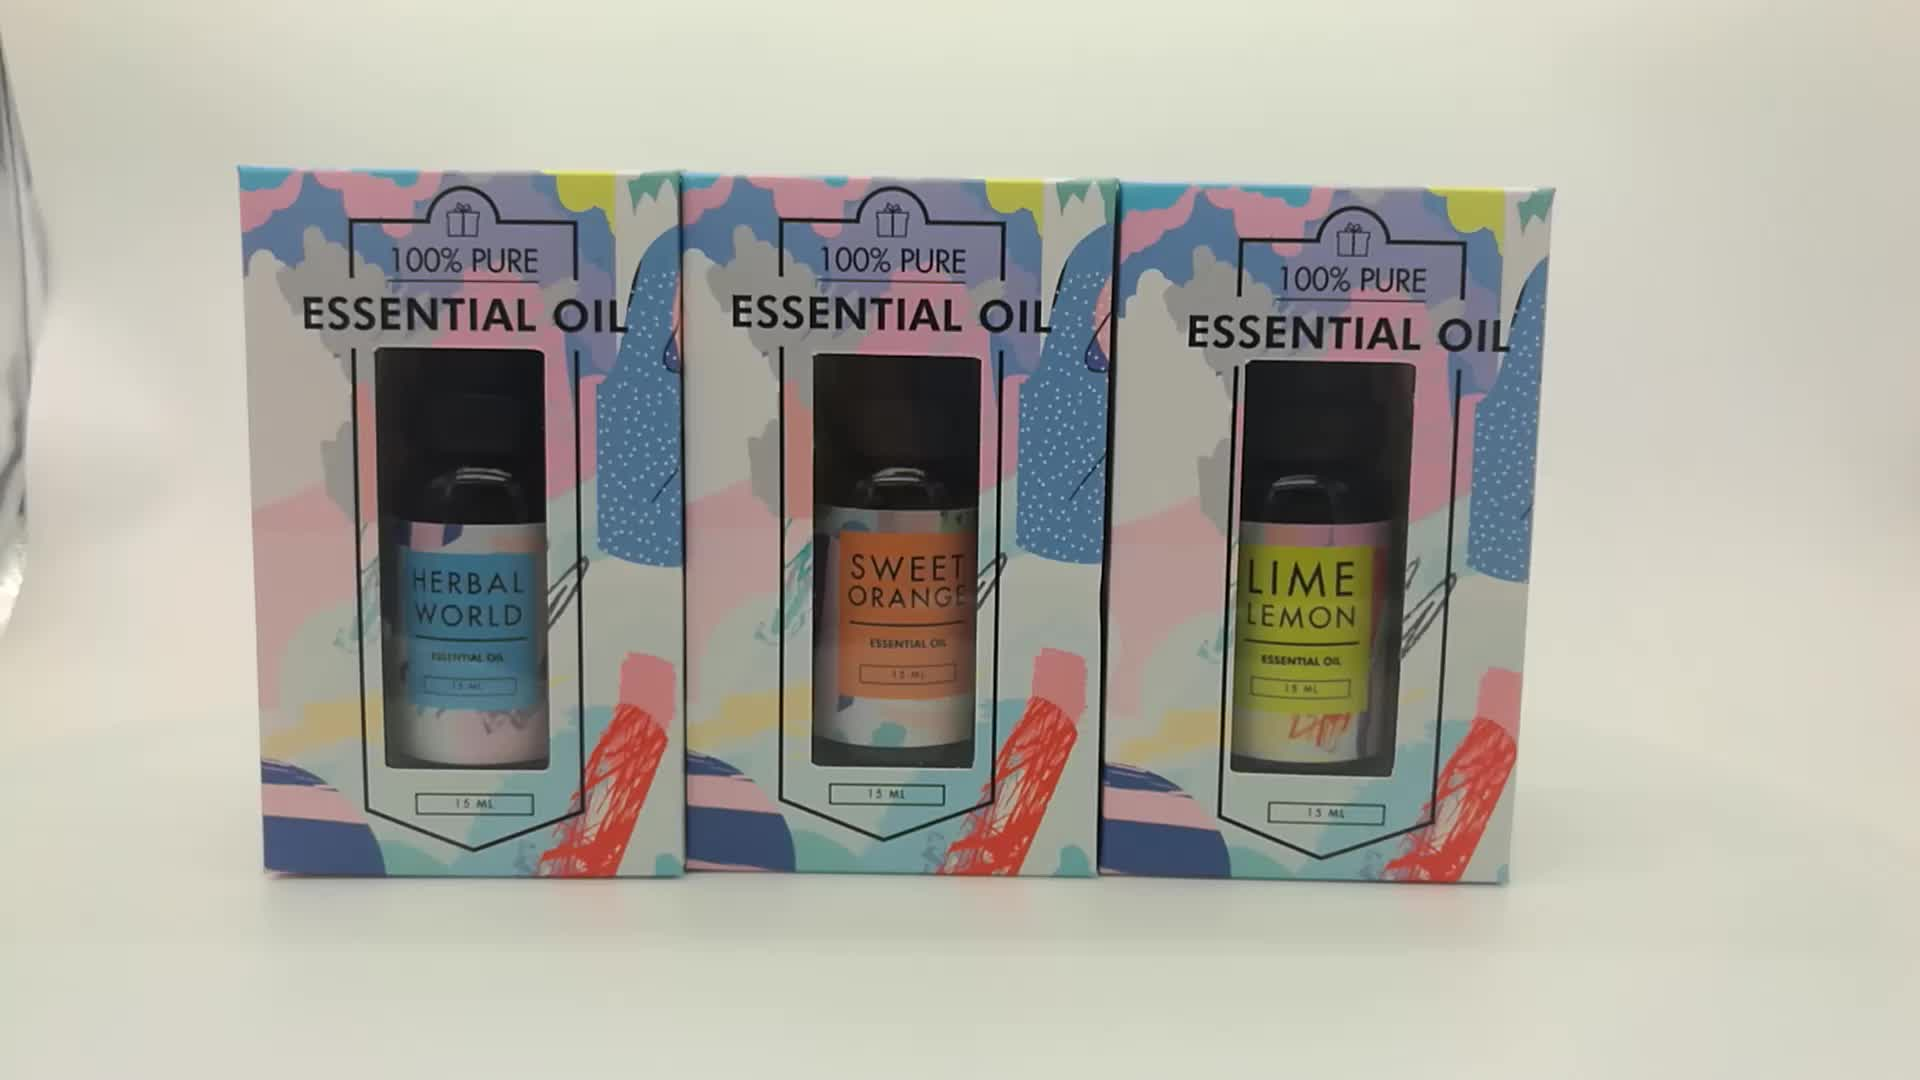 Aromatheropy natural essential oil 100% pure & aromatheropic skin care